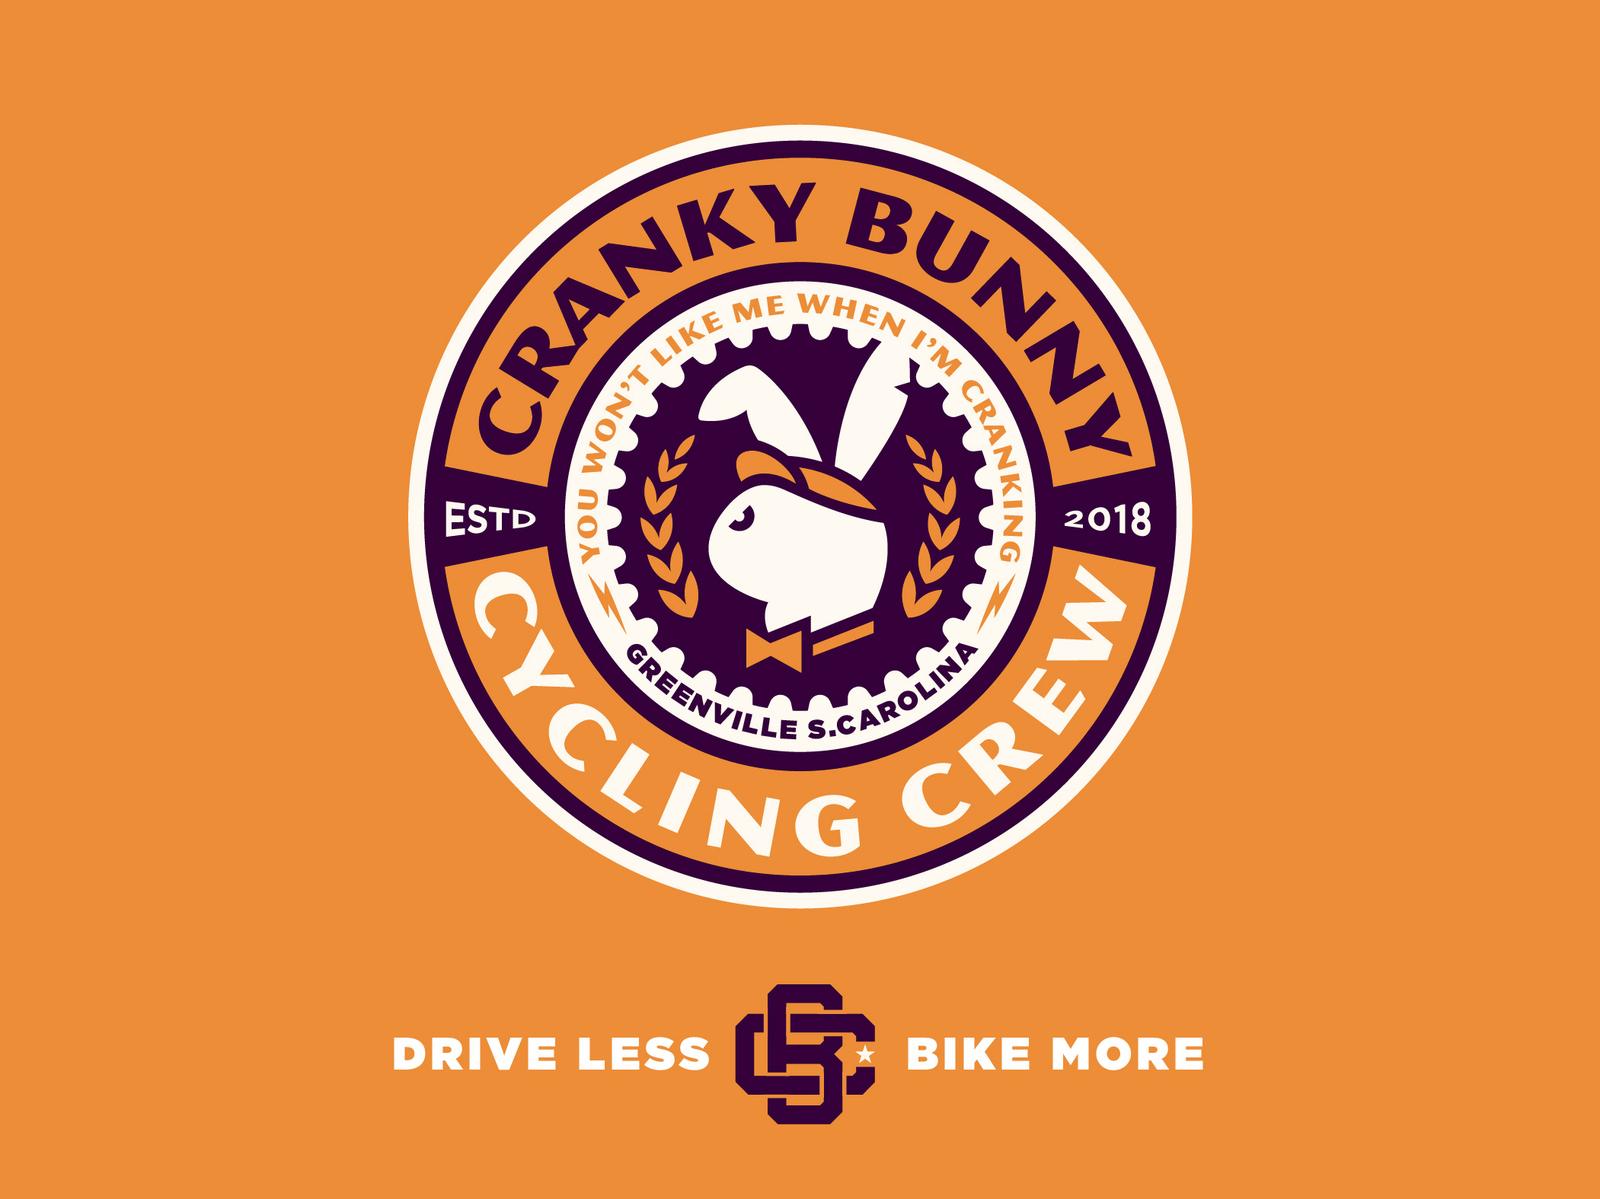 Cbcc logo 05 05 4x